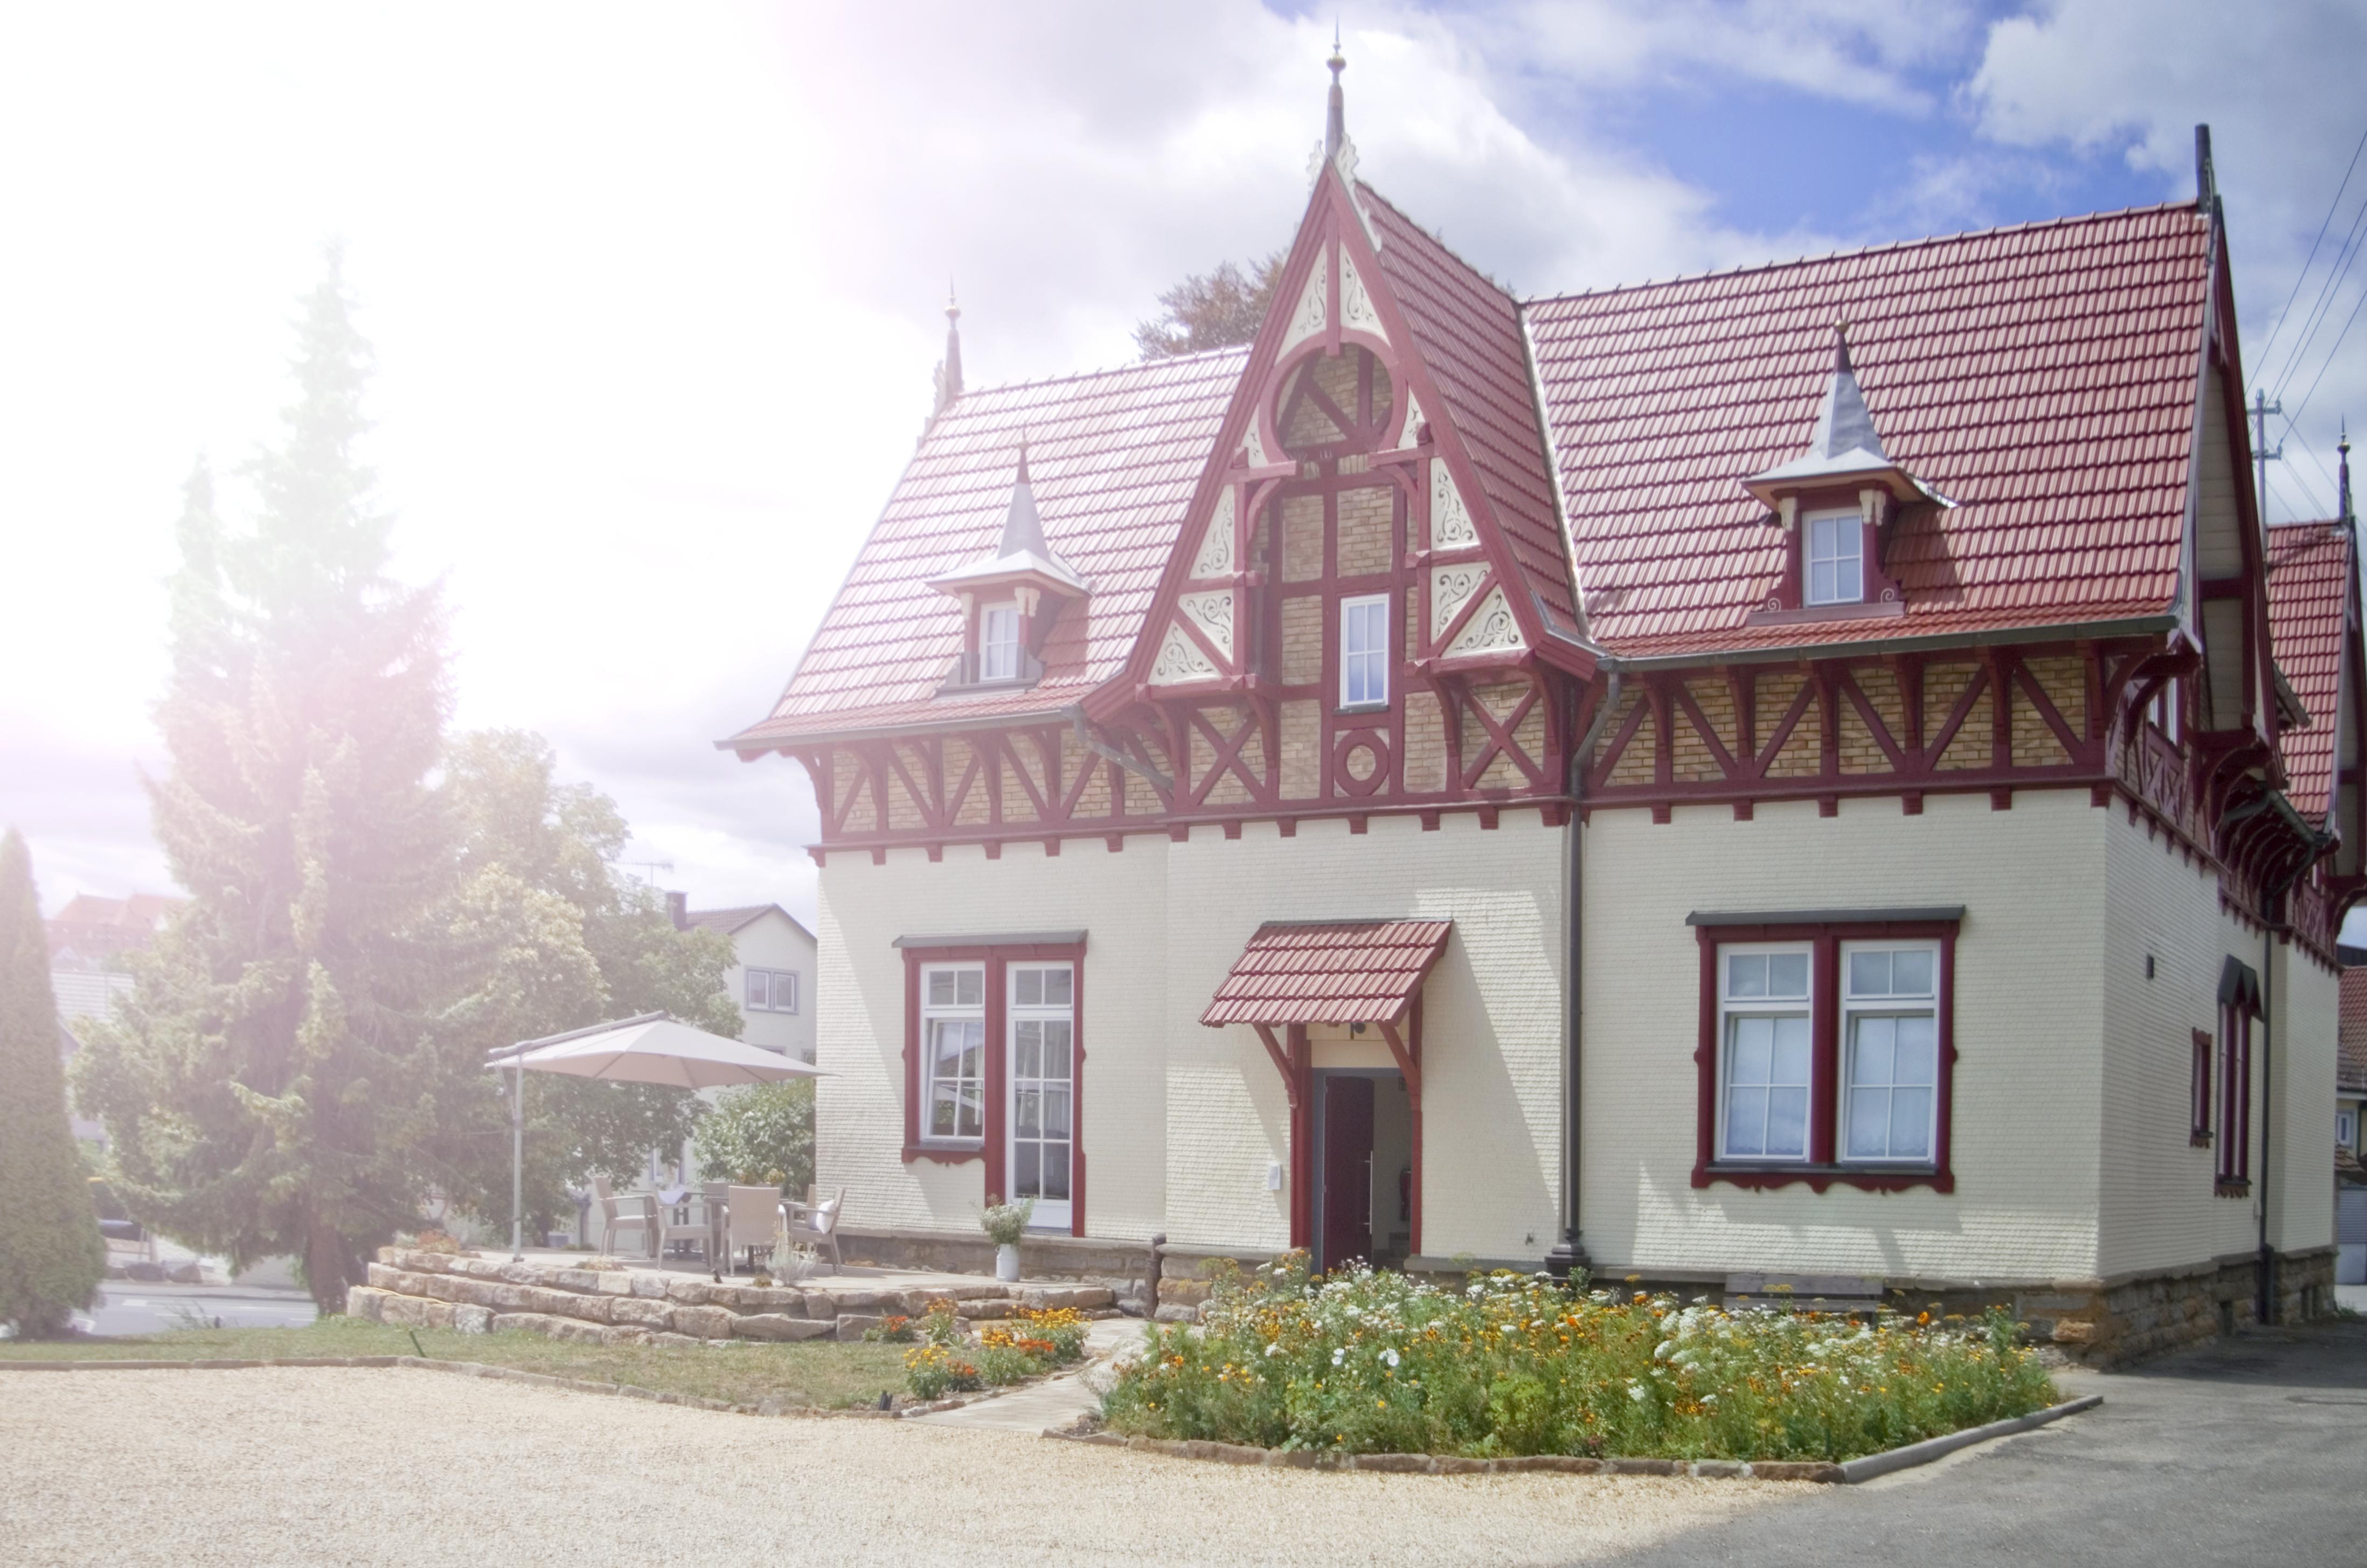 Stadtvilla Hotel Hechingen